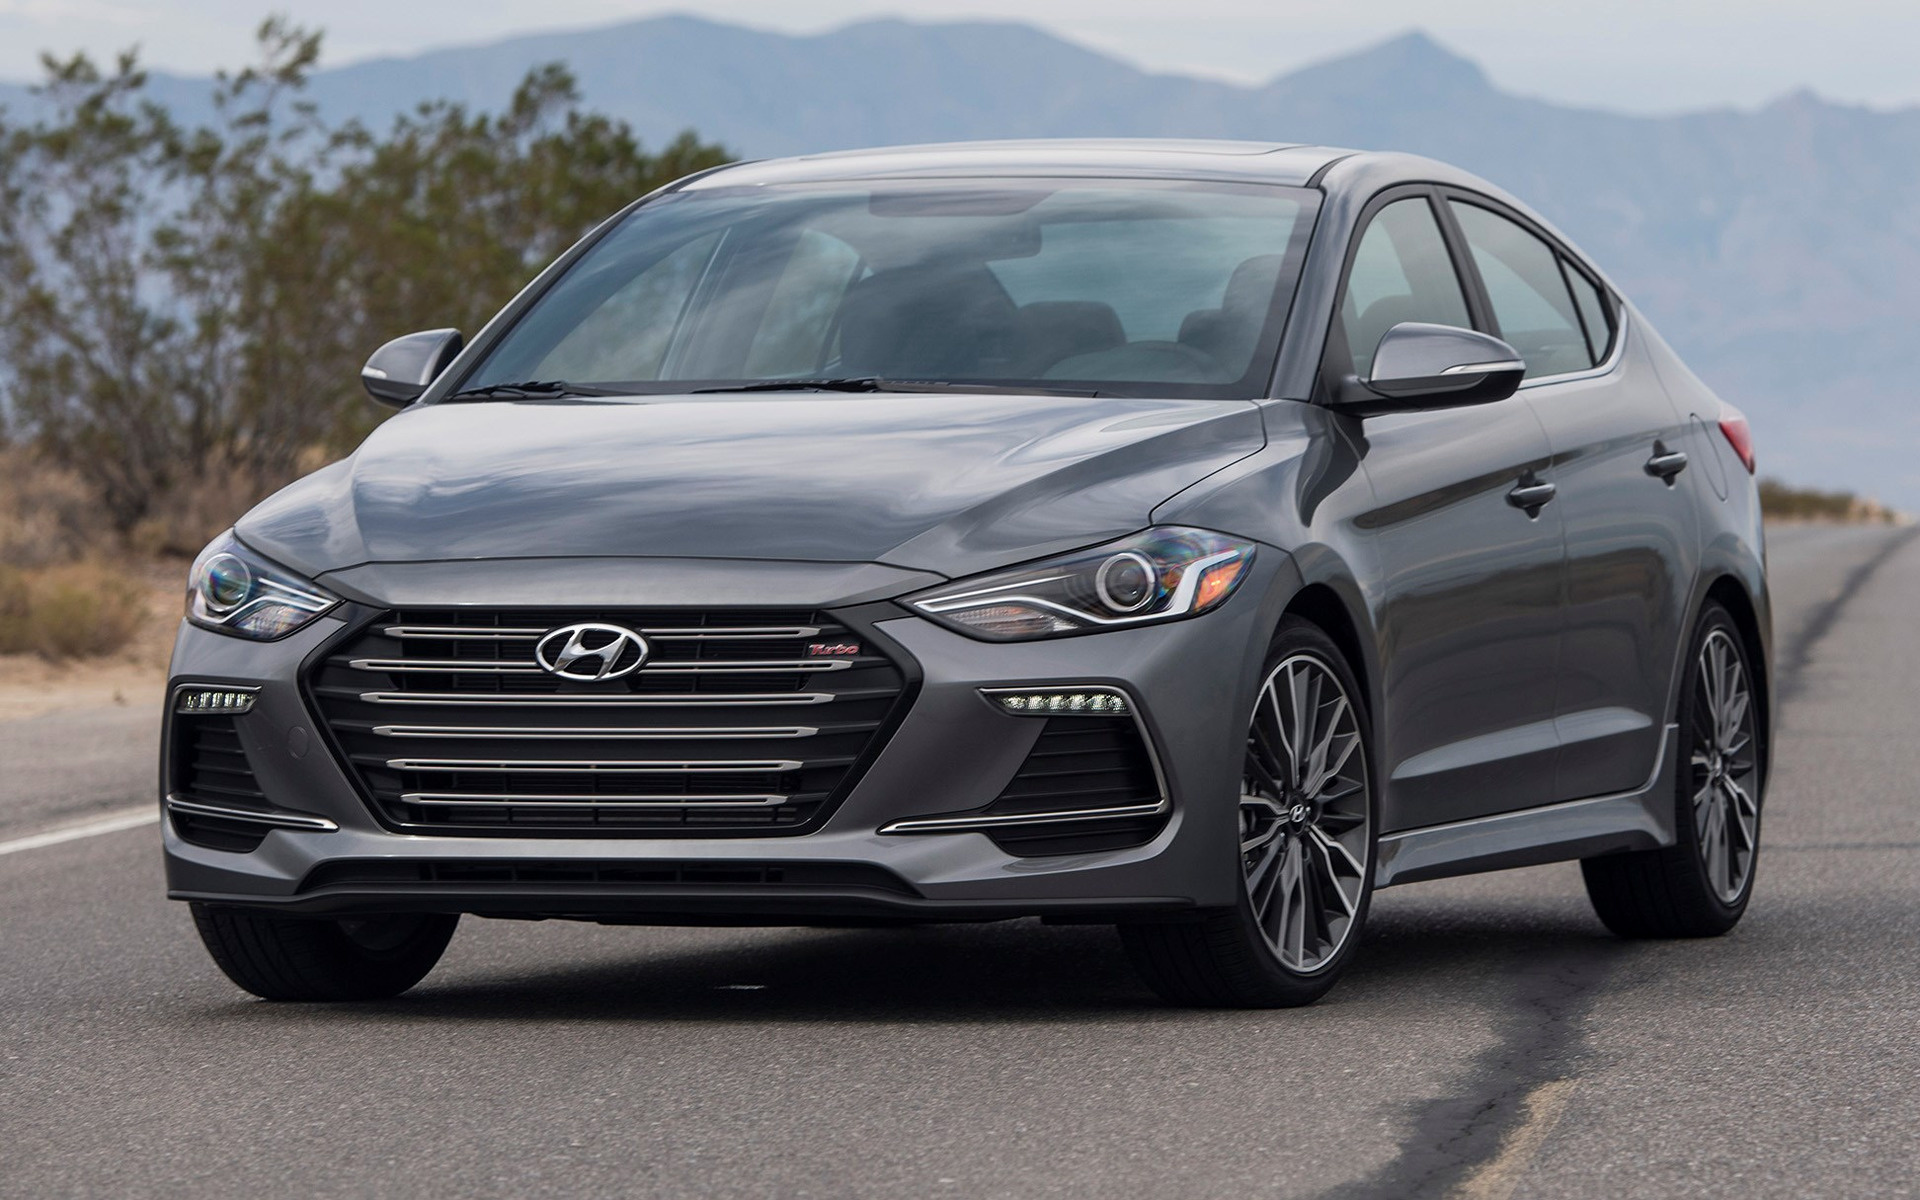 2017 Dodge Ram >> Hyundai Elantra Sport (2017) US Wallpapers and HD Images ...